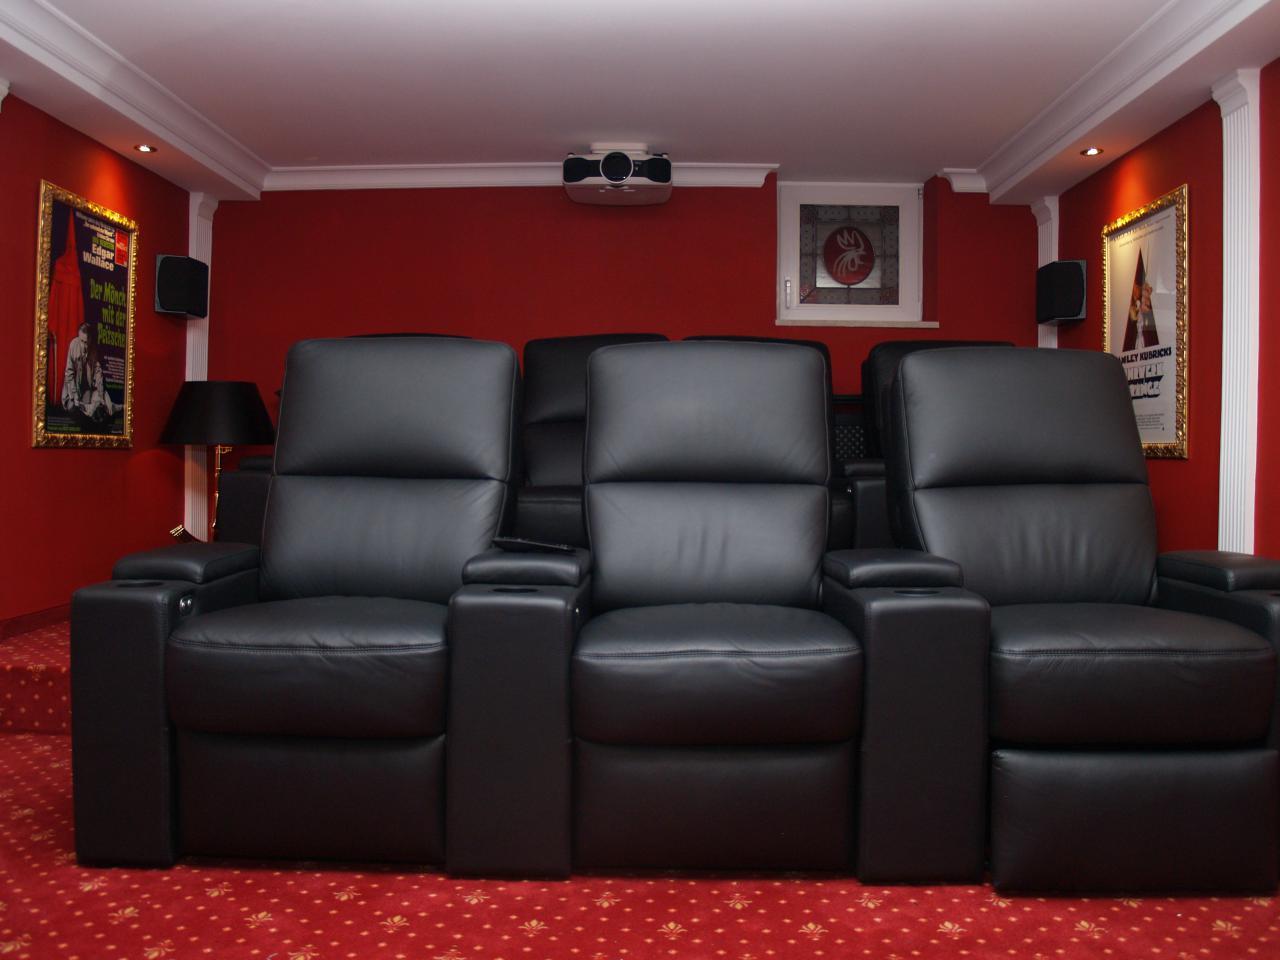 heimkino dream in red. Black Bedroom Furniture Sets. Home Design Ideas